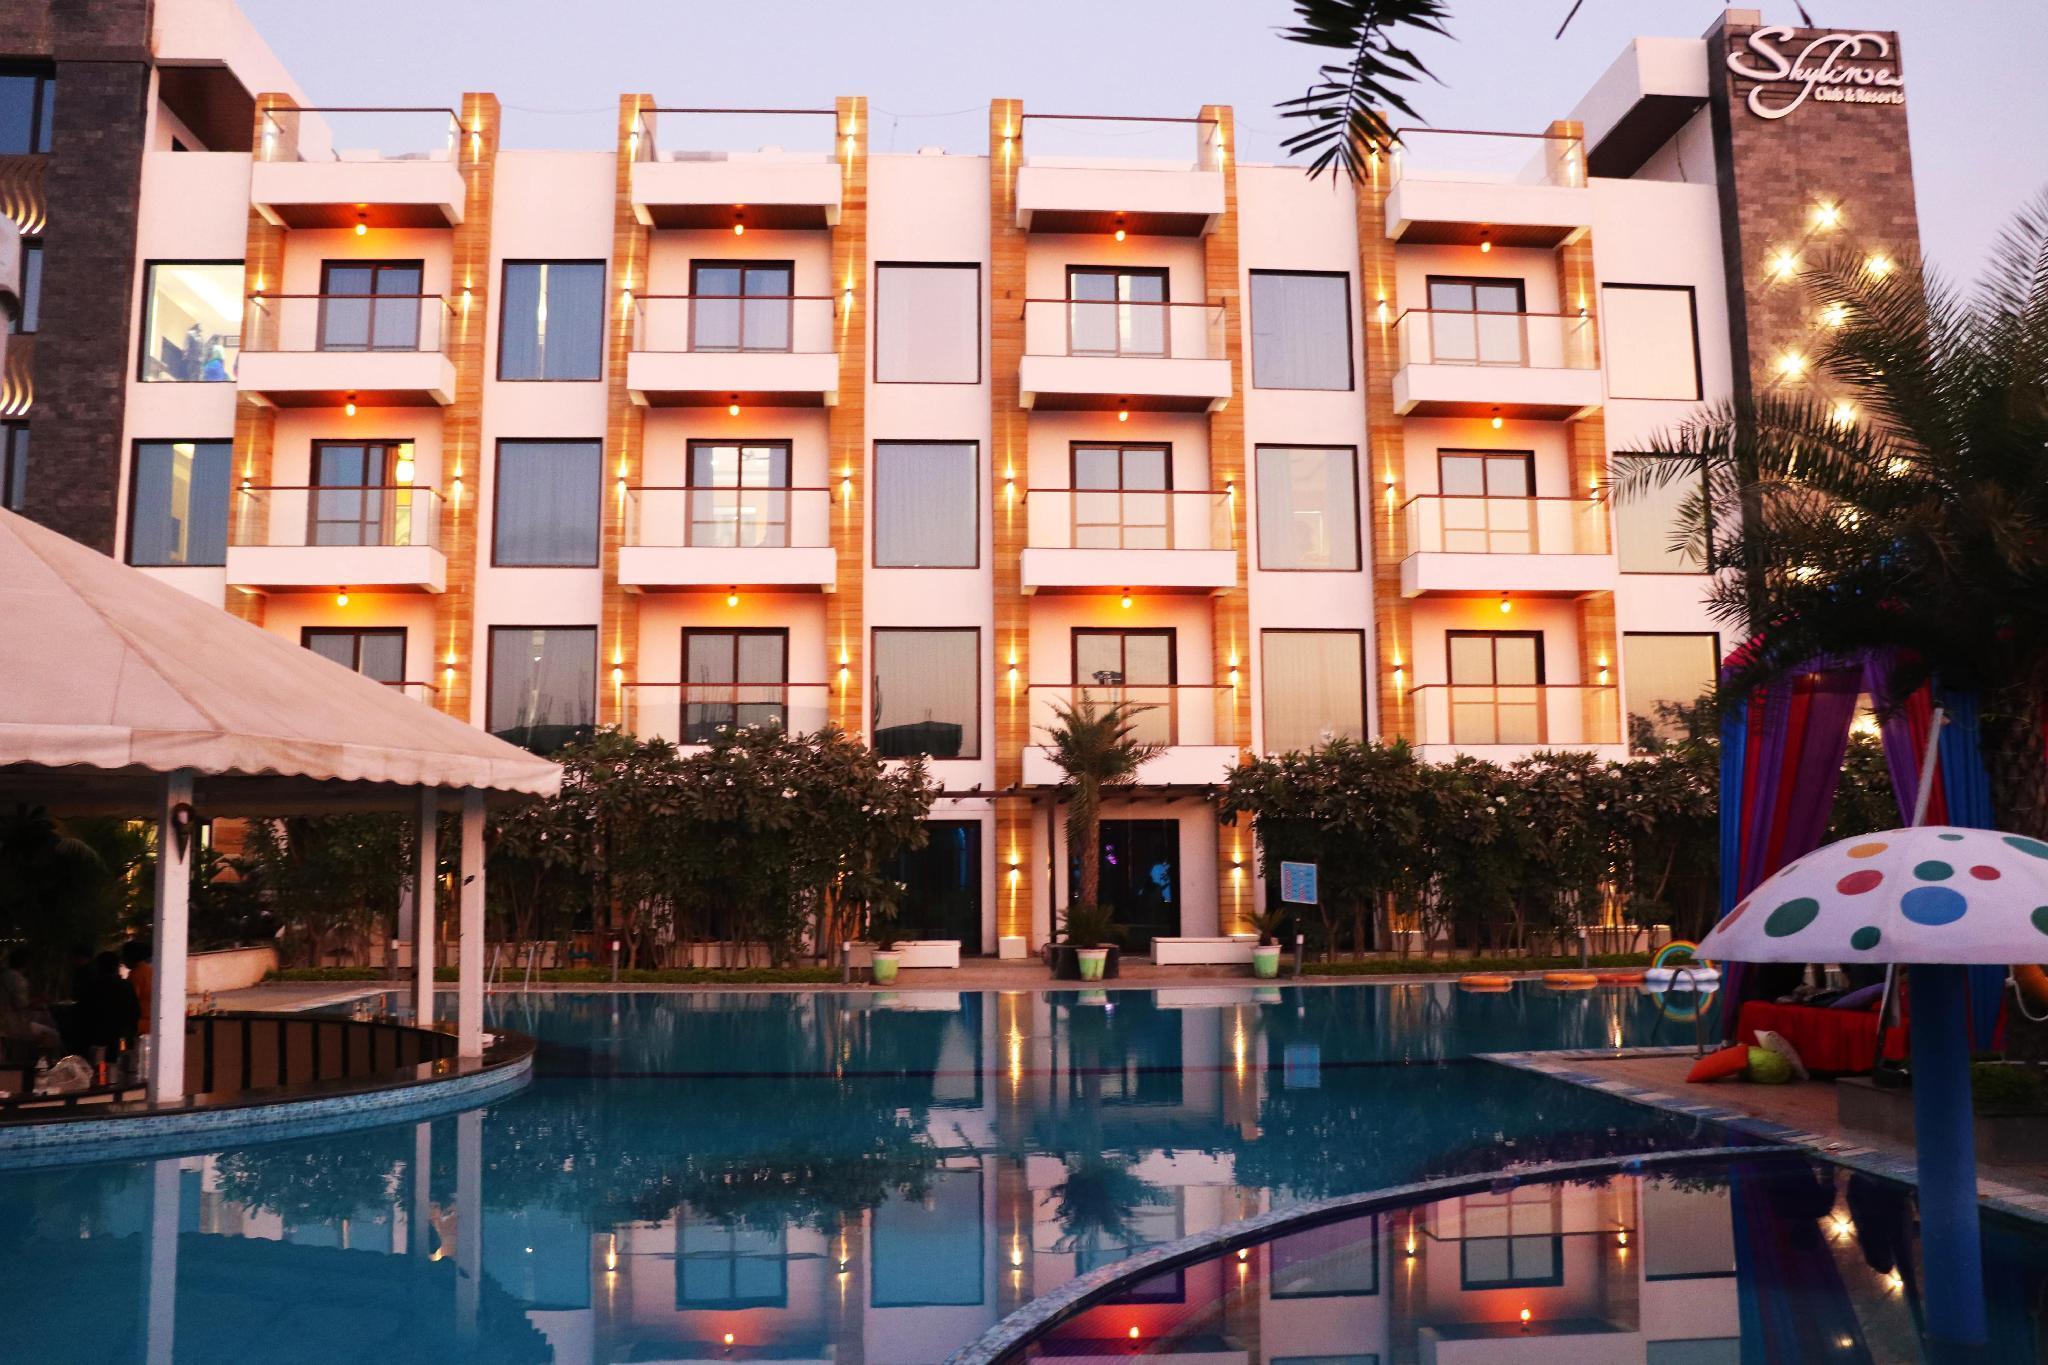 Skyline Club And Resorts